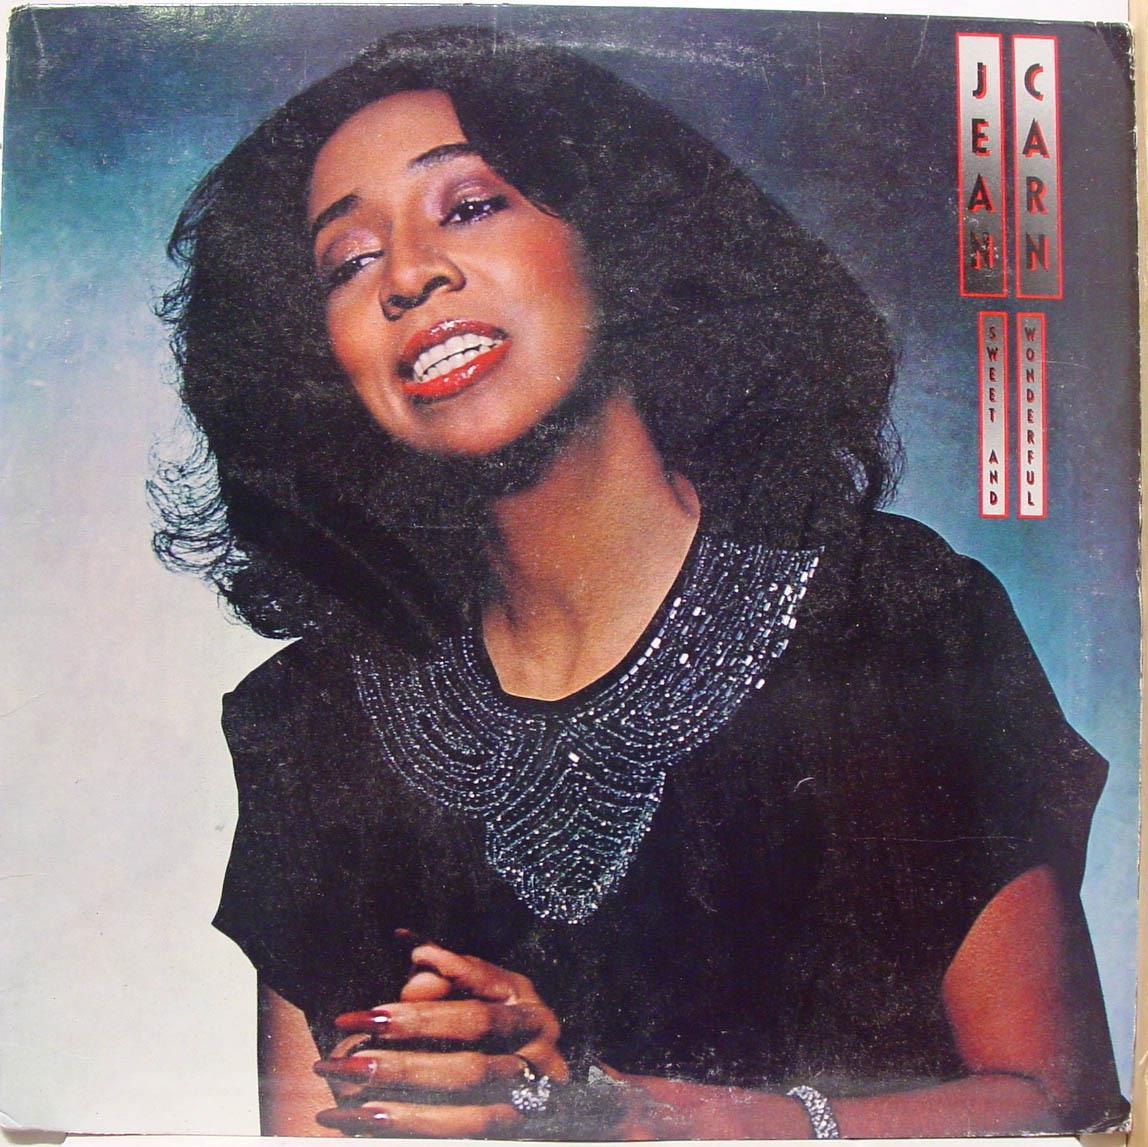 Jean Carn - Jean Carn Sweet And Wonderful Lp Vg+ Fz 36775 Tsop 1981 Disco Soul Funk (sweet And Wonderful)